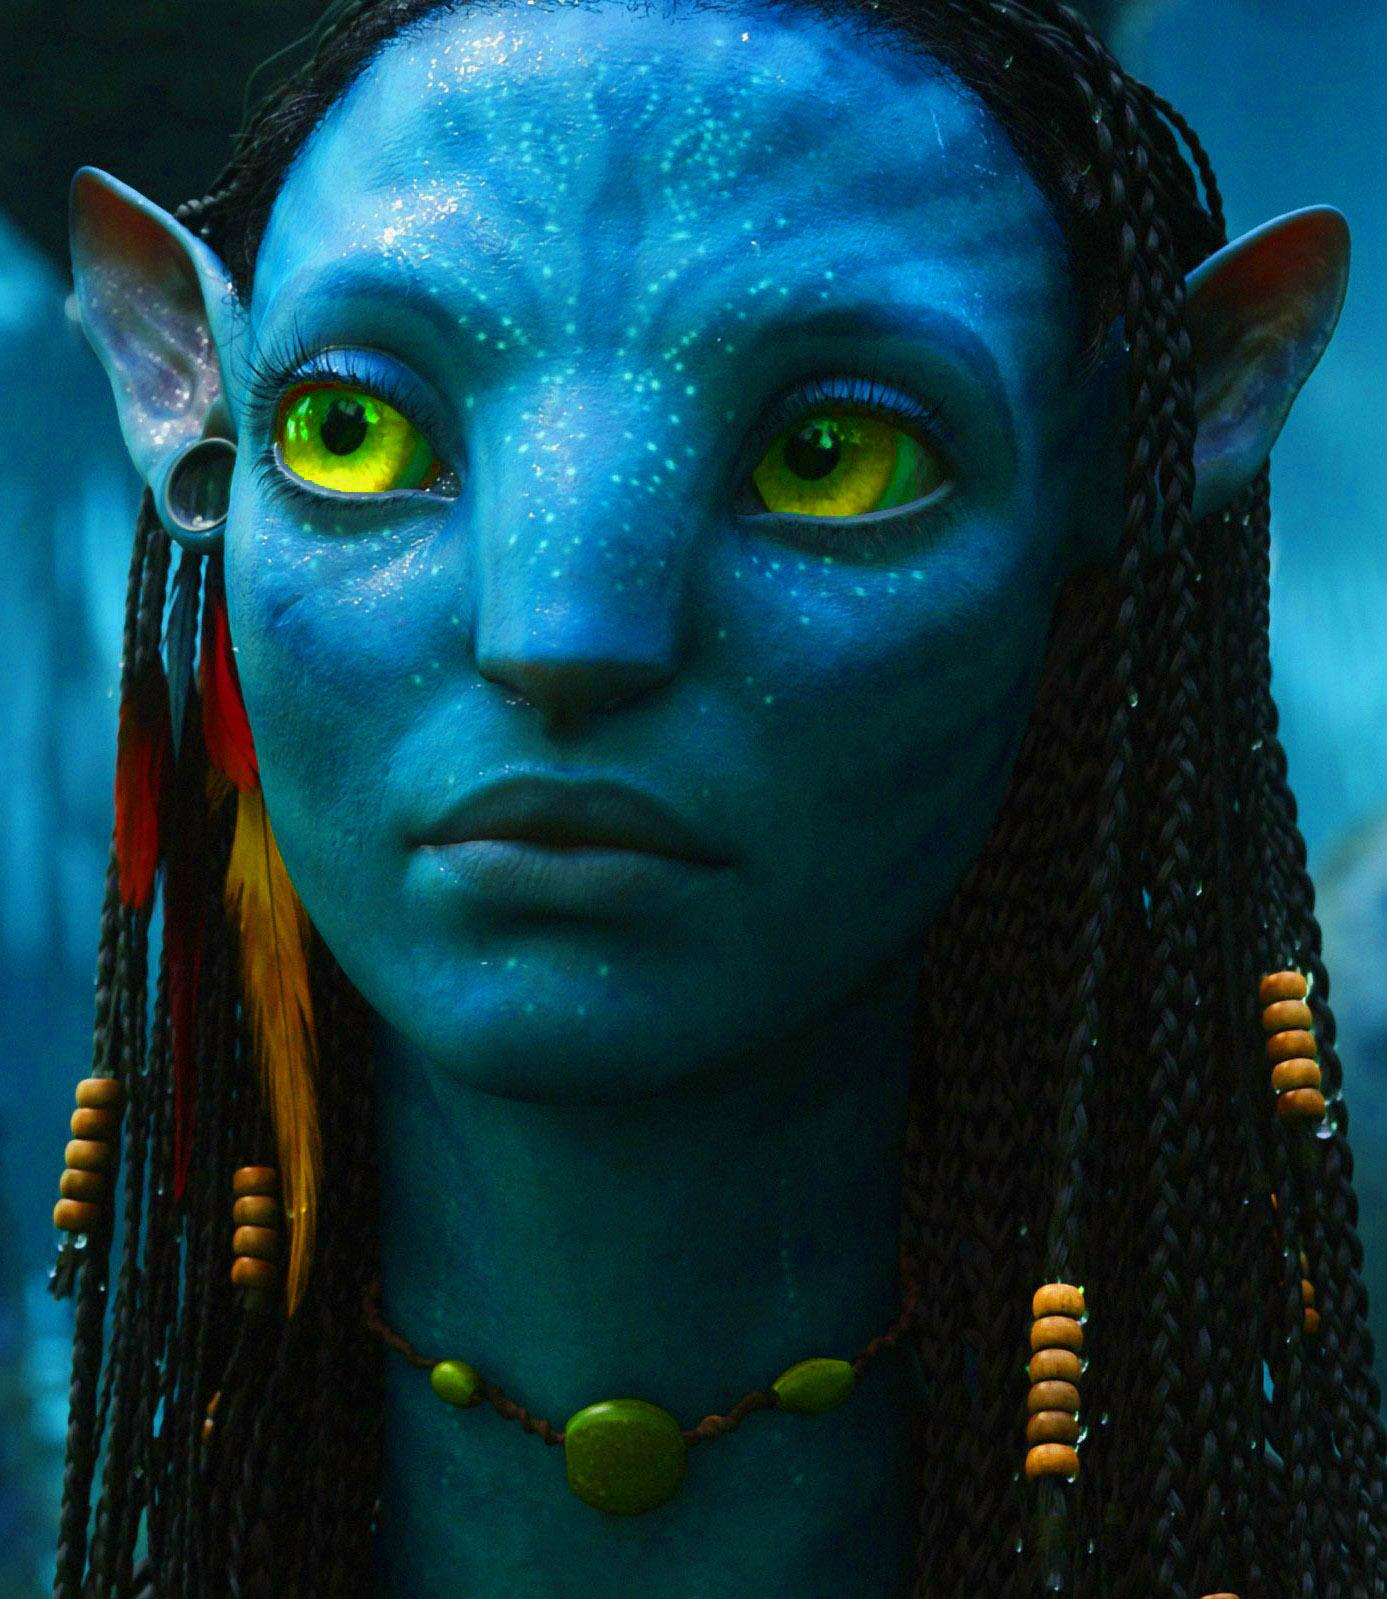 Avatar 2 Online Ru: Загрузка картинки 28374 / Аватар, Avatar, фильм, кино